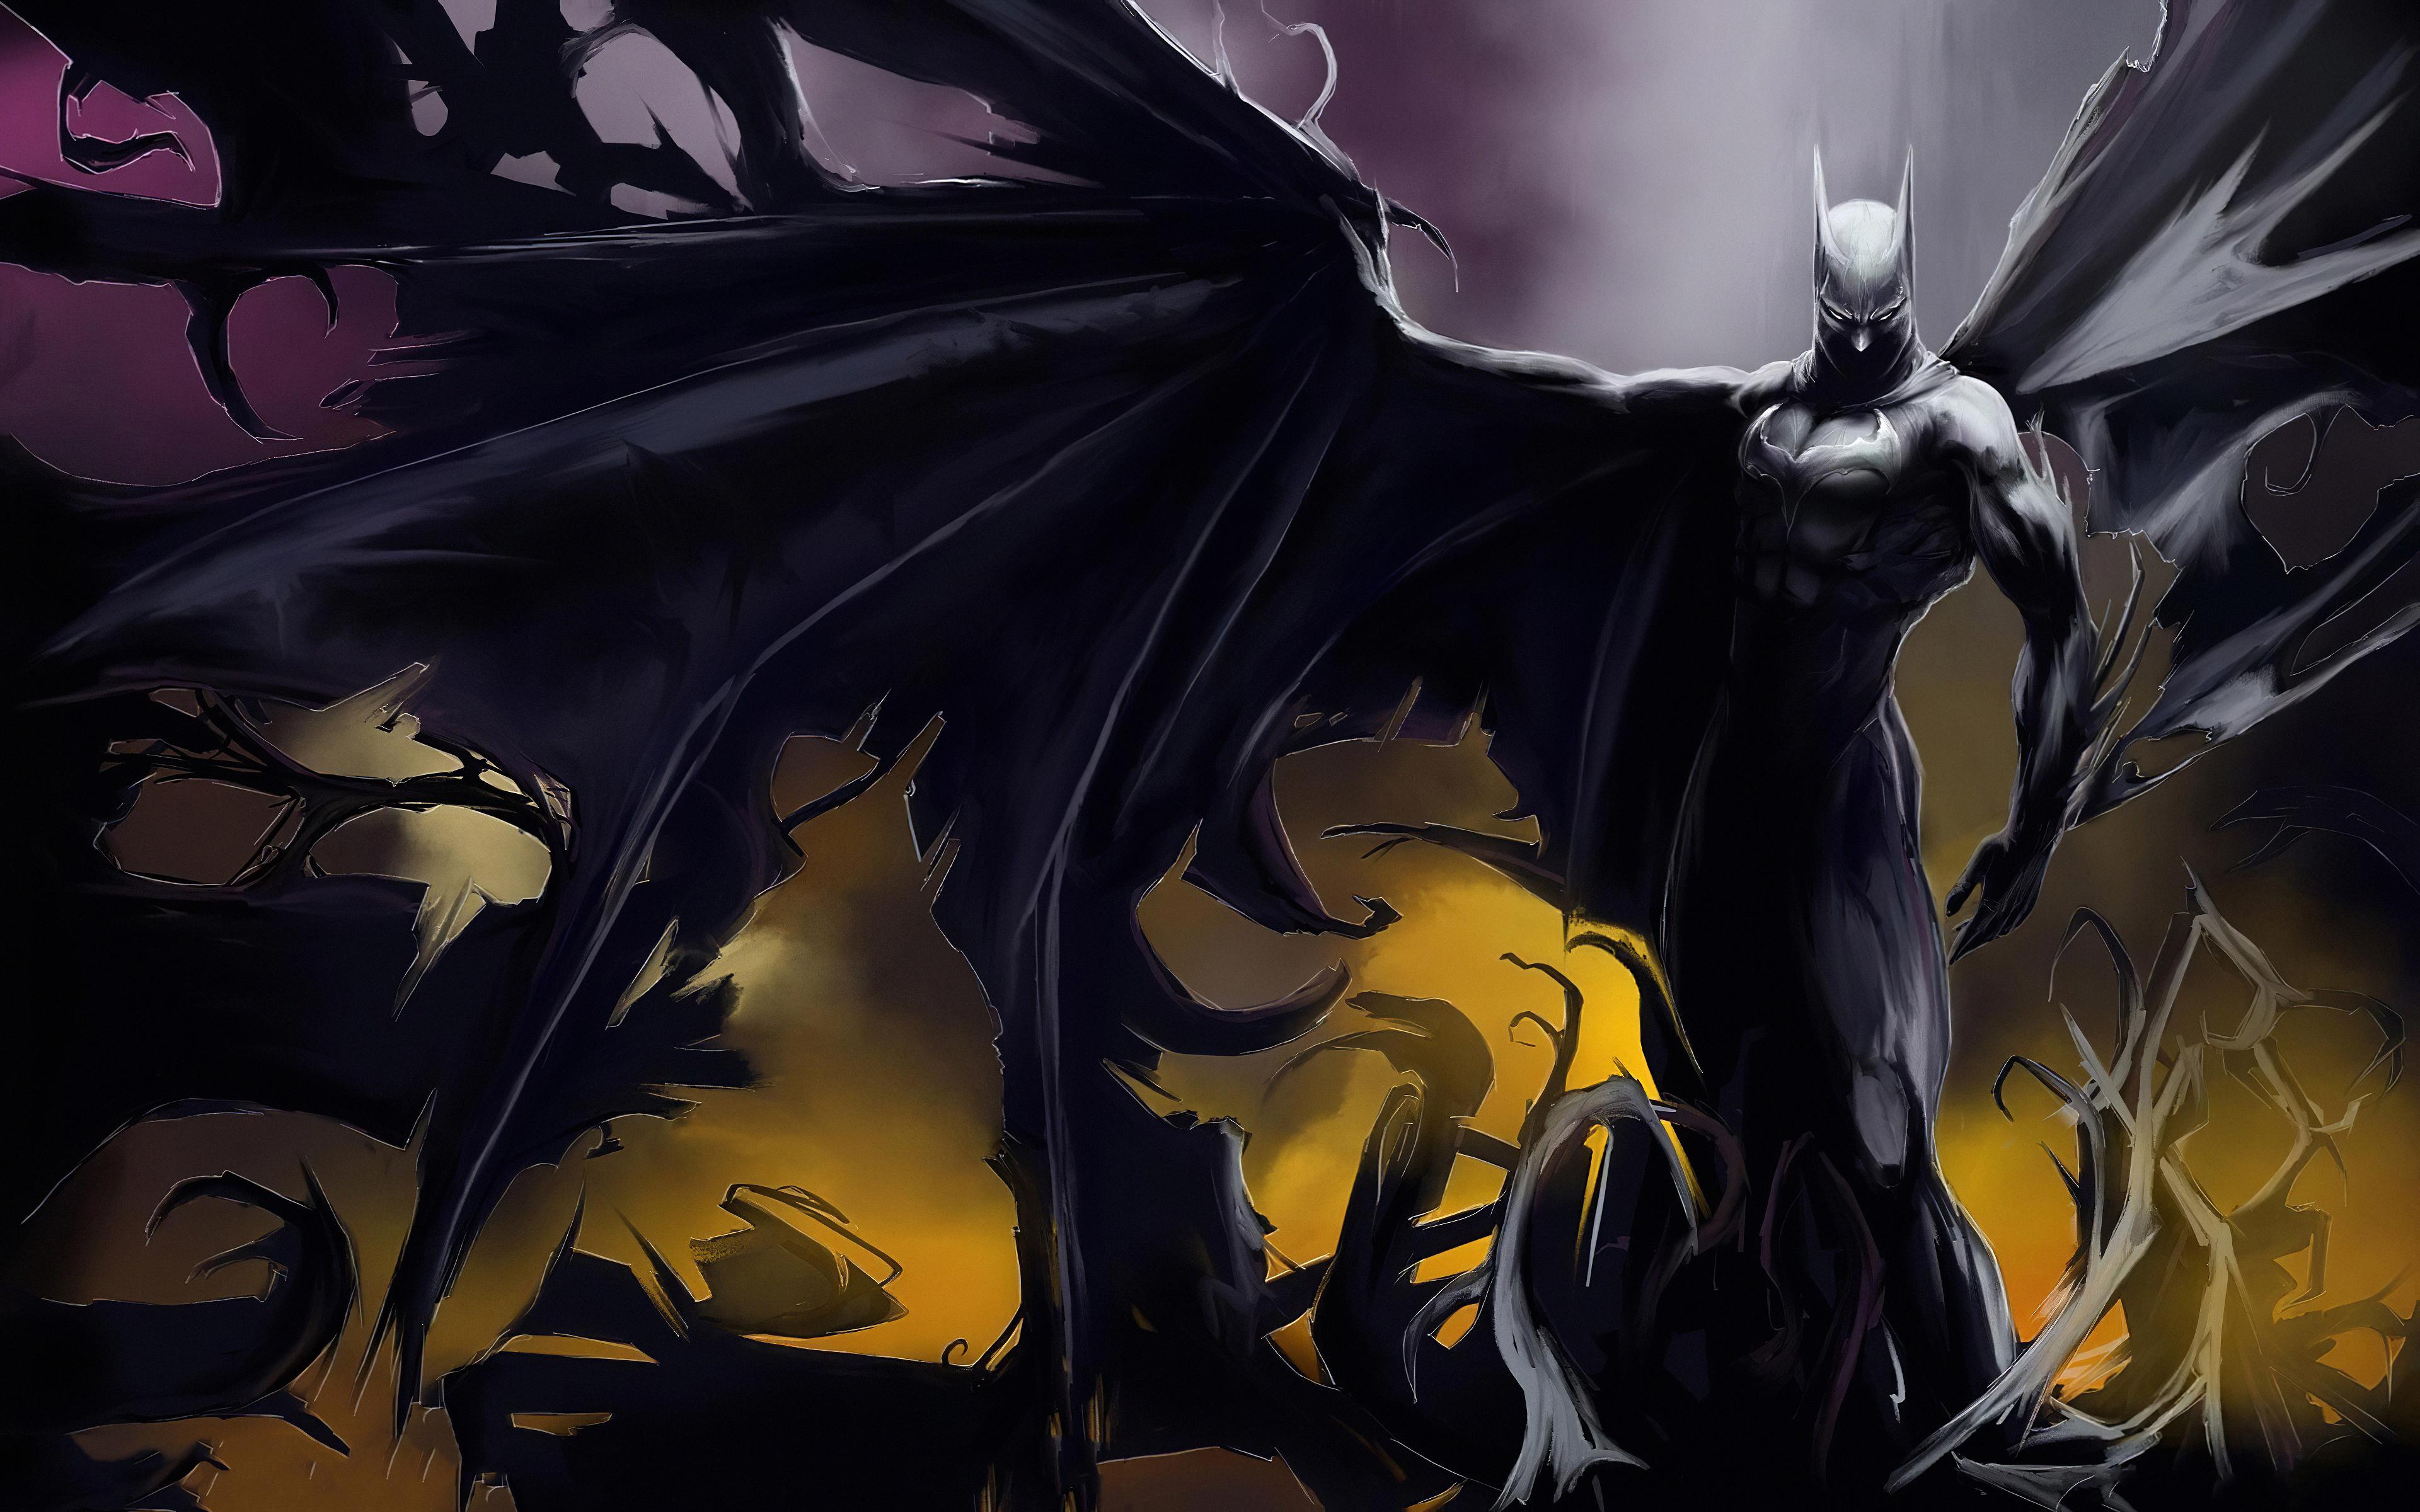 the batman artwork 1576097987 - The BatMan Artwork - dark knight wallpaper 4k, batman wallpaper phone hd 4k, batman wallpaper 4k, batman art wallpaper 4k, Batman 4k hd wallpaper